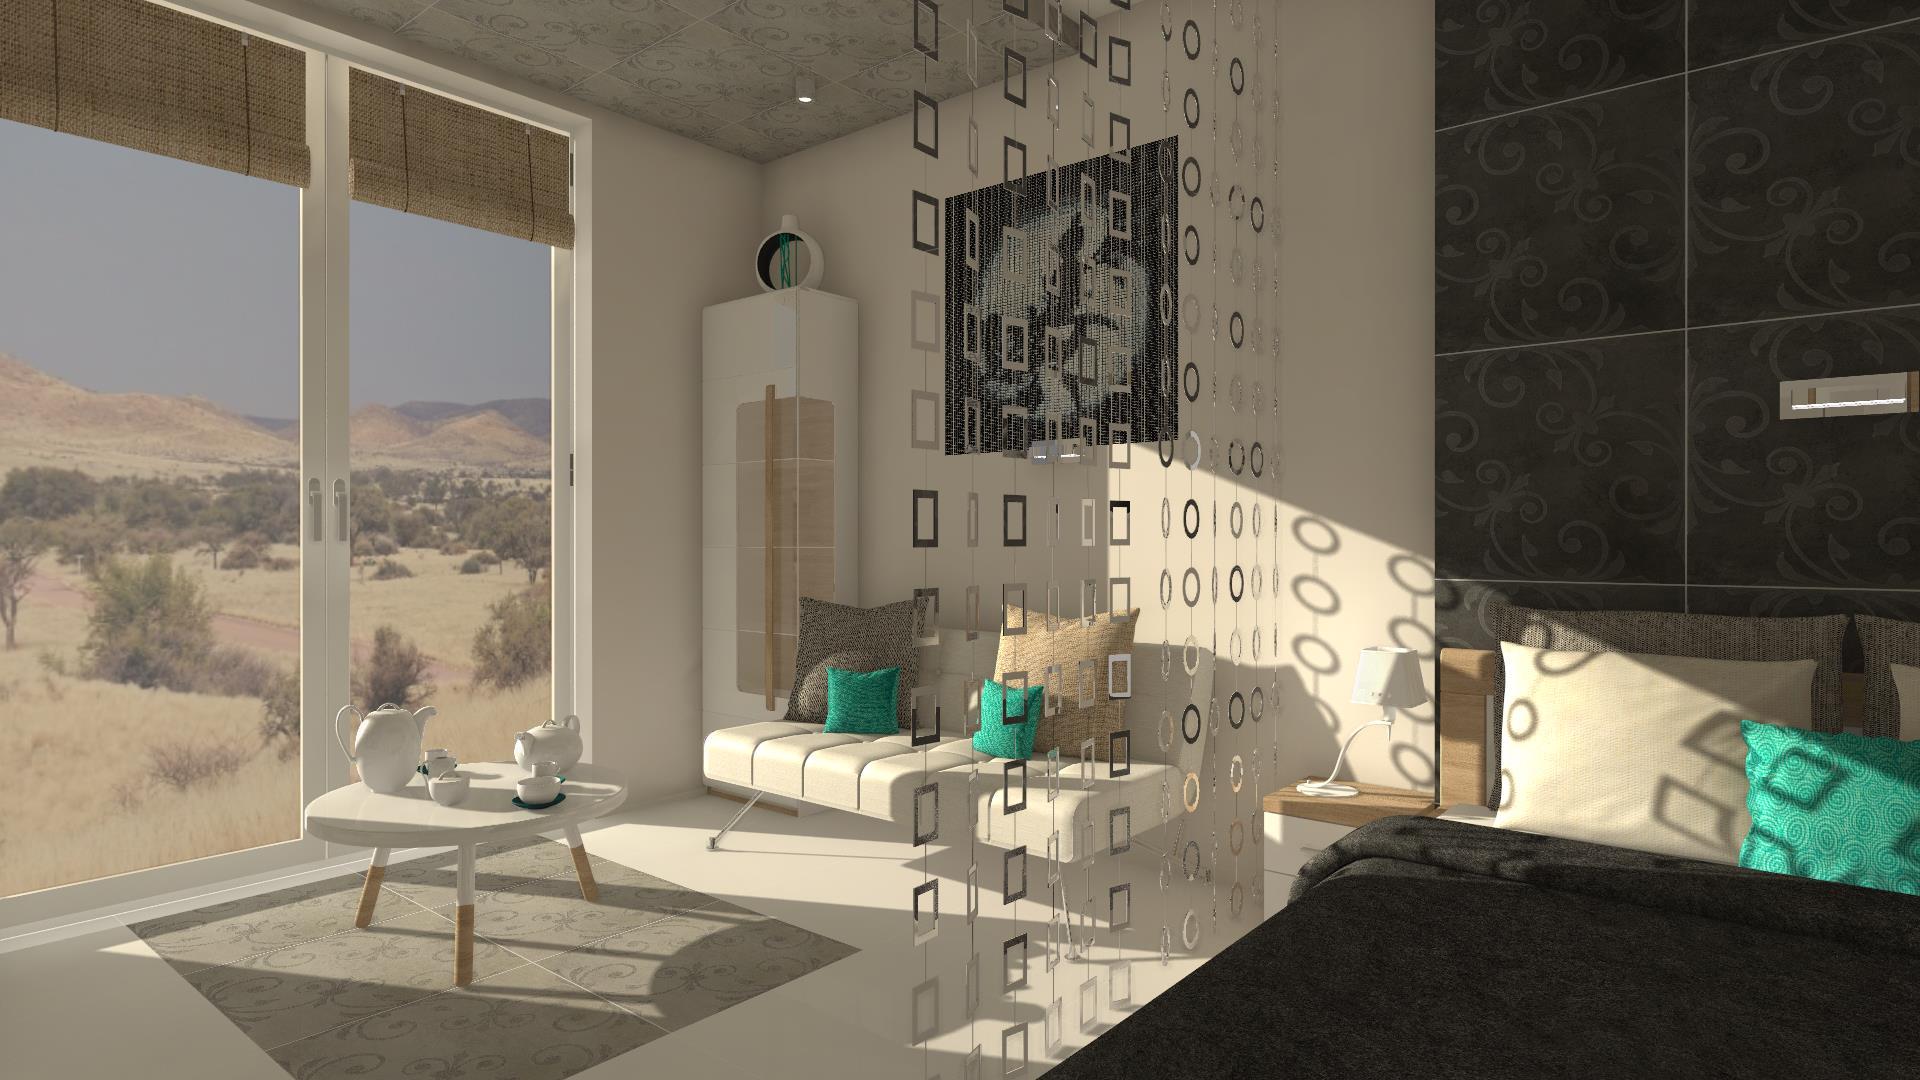 Apartament w Afryce